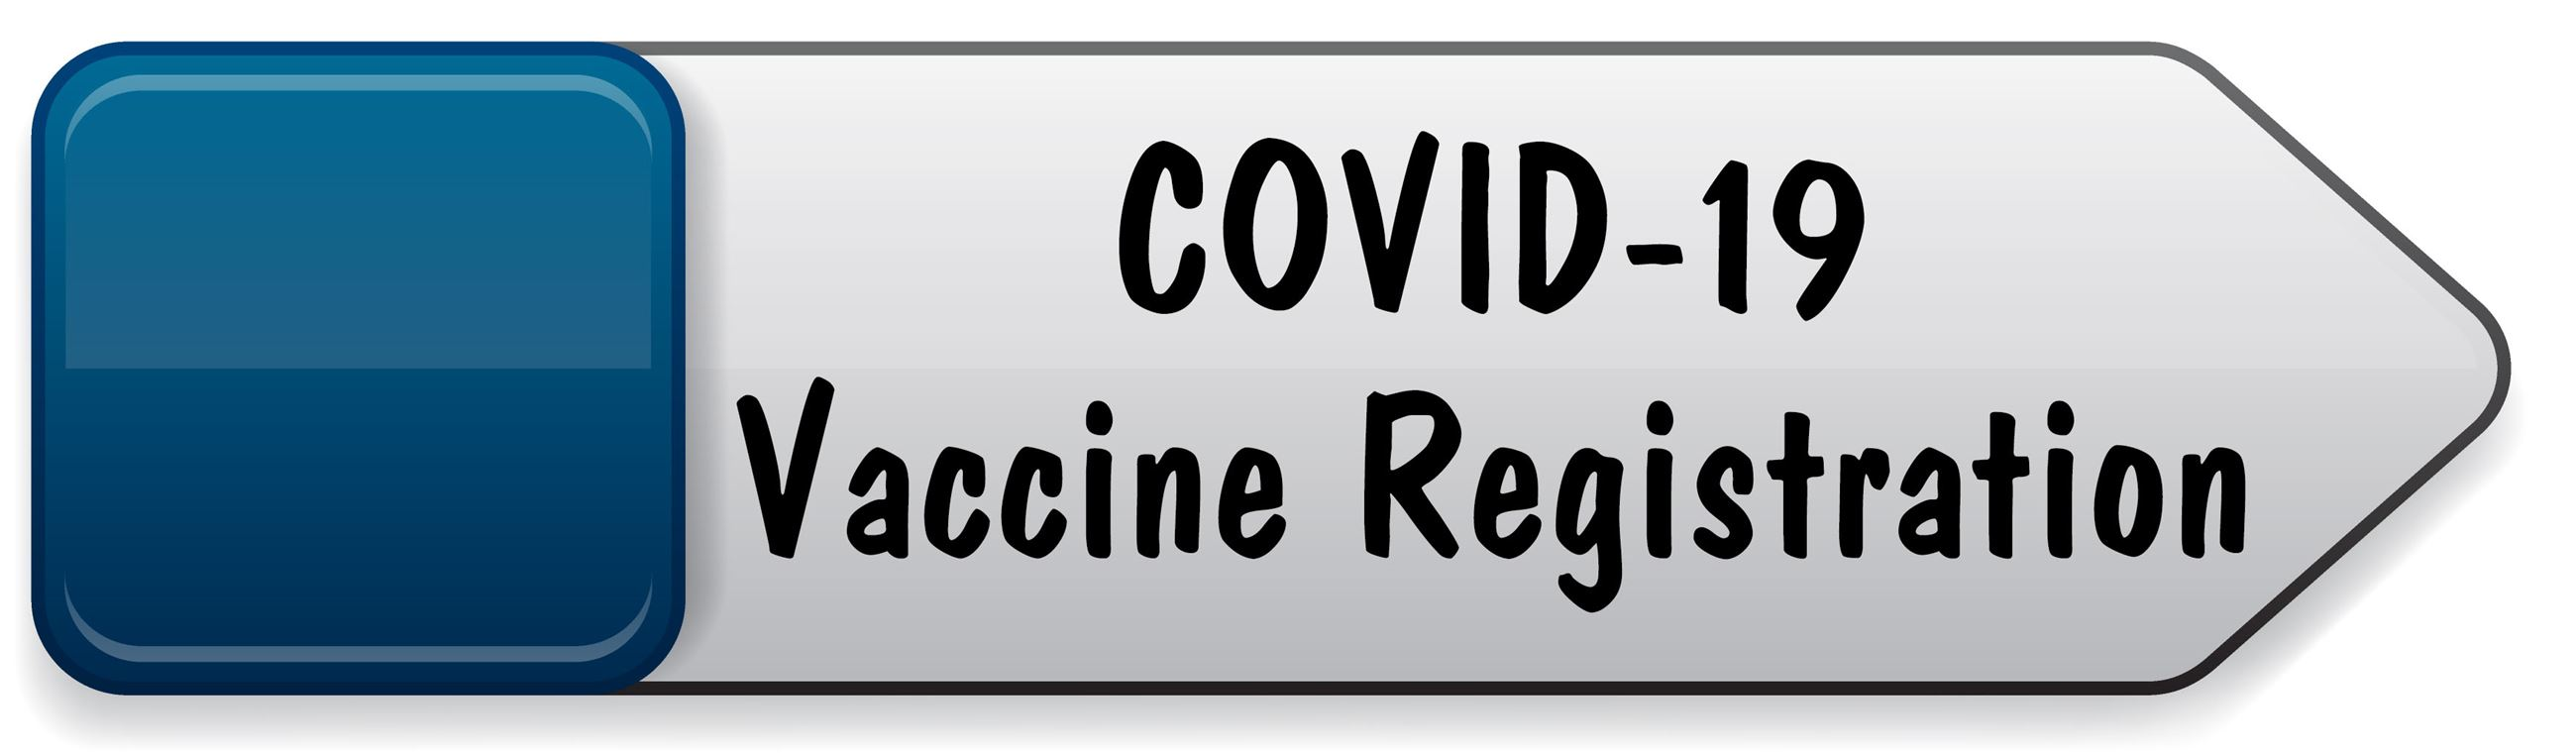 COVID-19 Vaccine Registration | Graham County, AZ